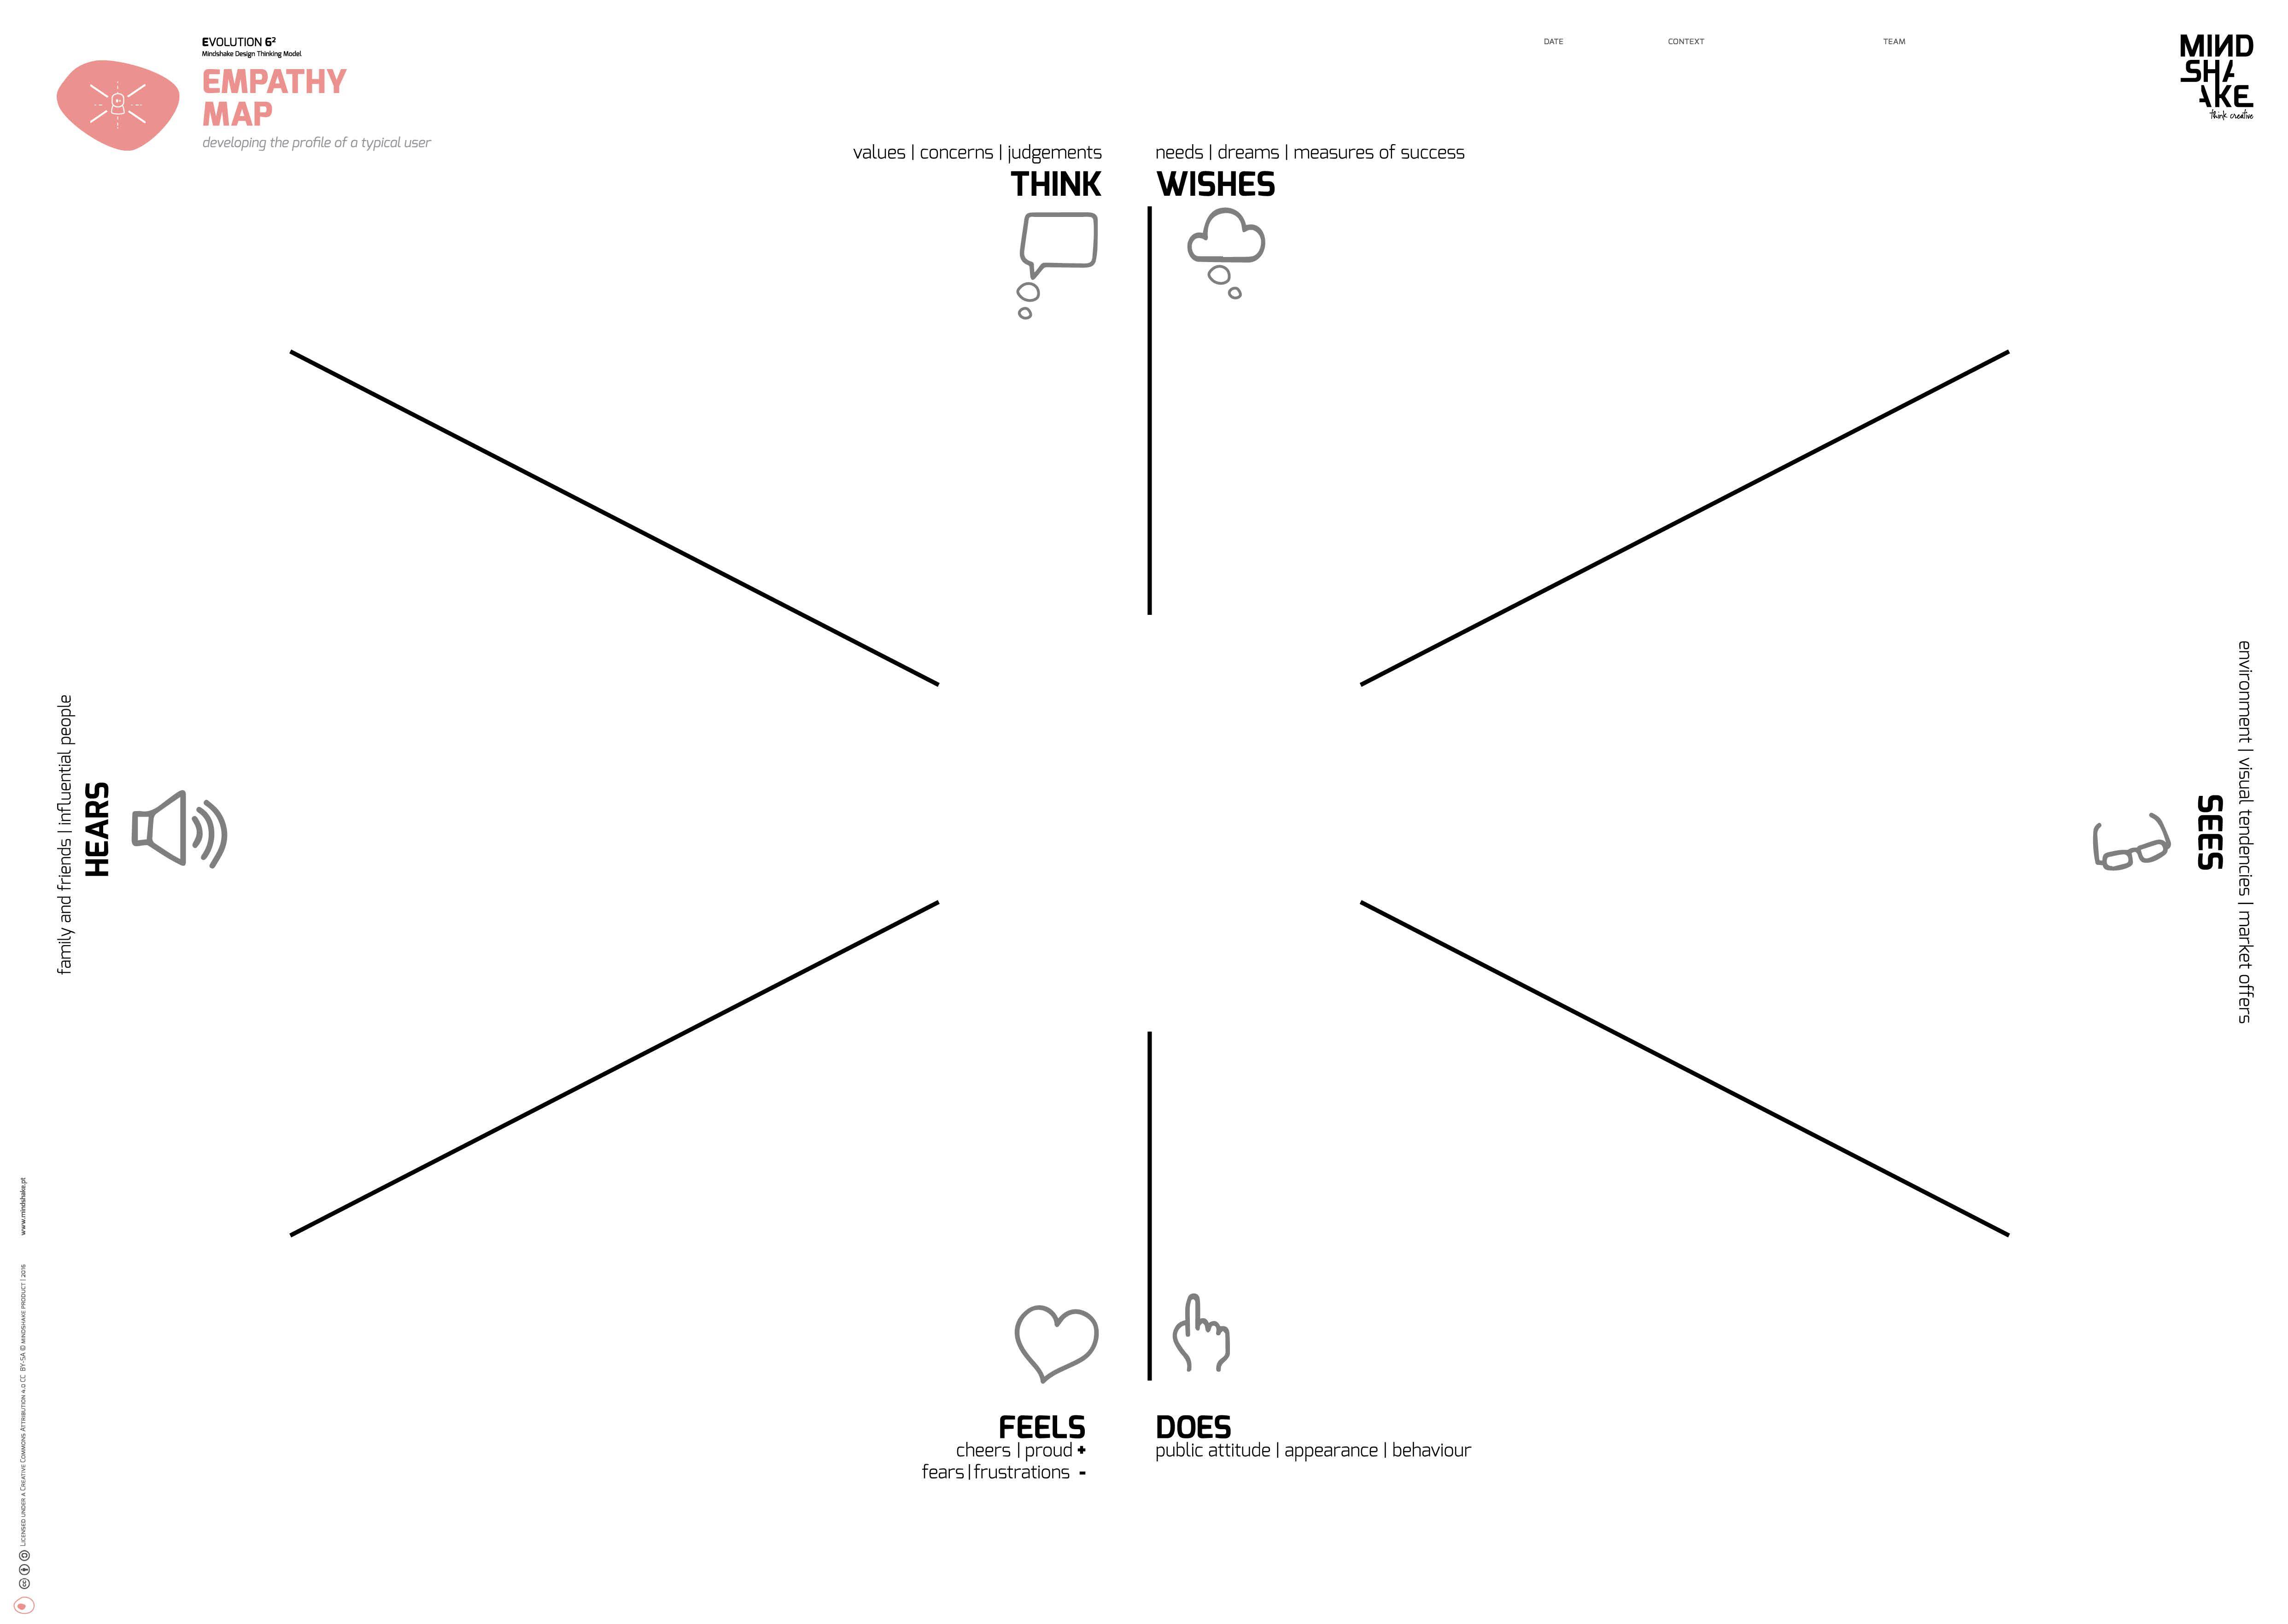 Empathy map mindshake design thinking templates pdf mindshake empathy map mindshake design thinking templates pdf maxwellsz